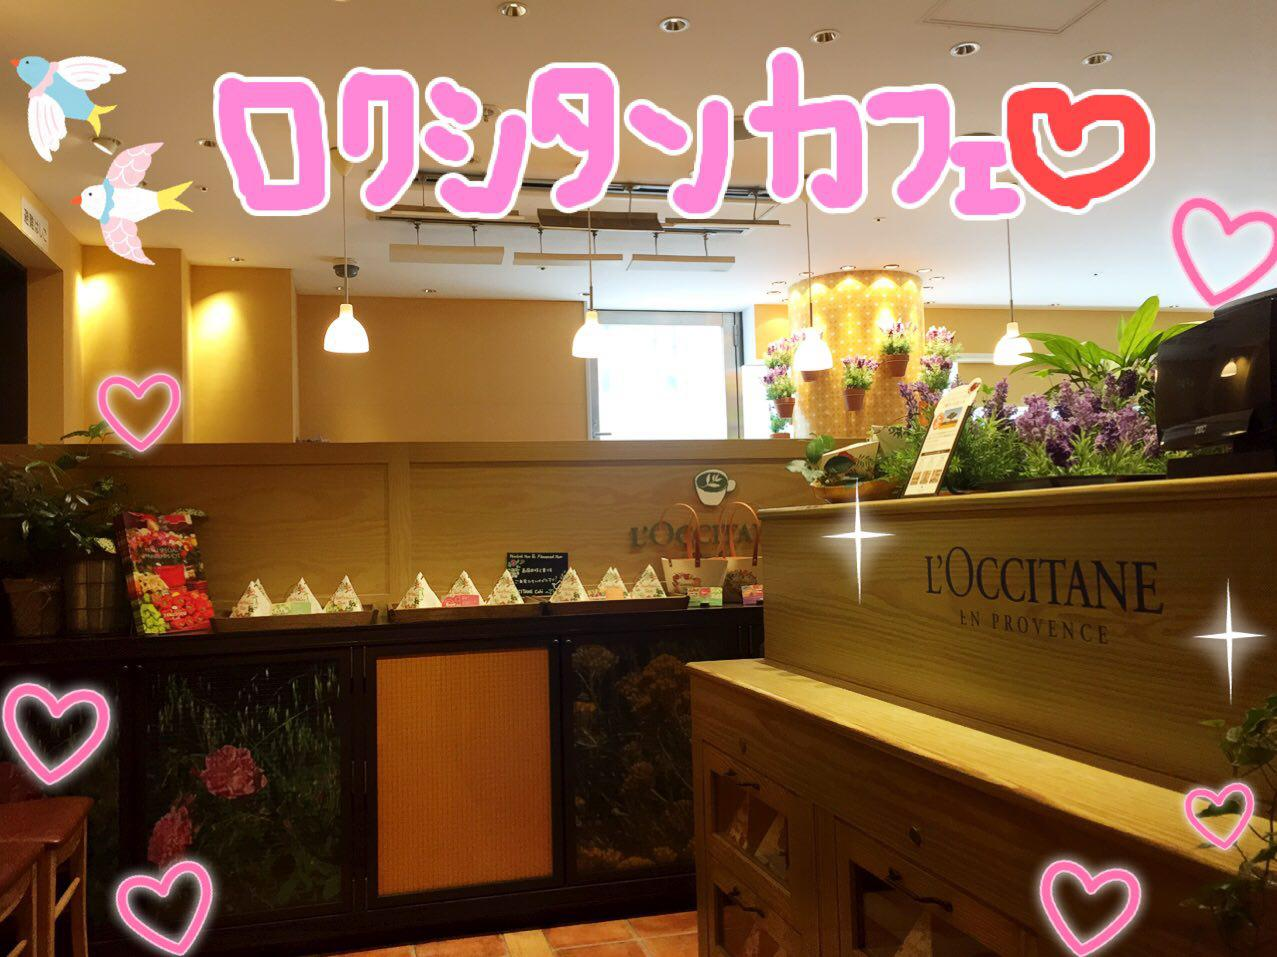 photo_2017-03-24_00-25-49.jpg